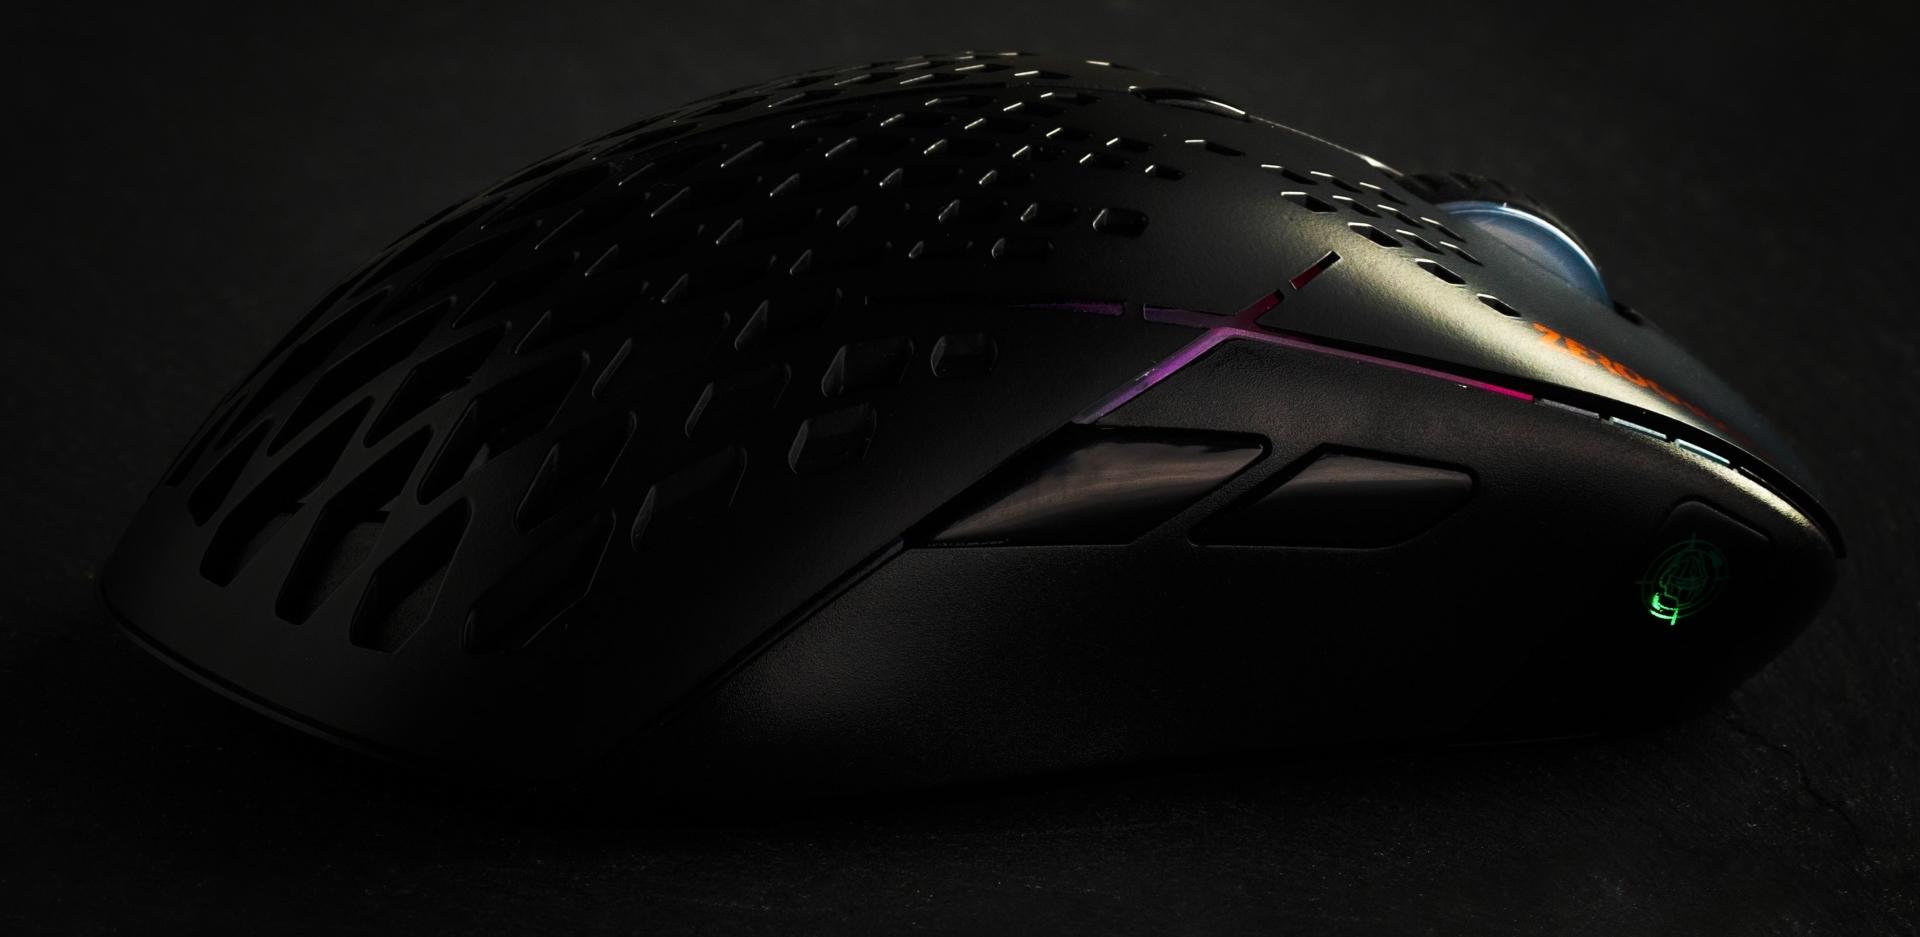 ZeroGround Hasiba 3.0 - Gaming mouse